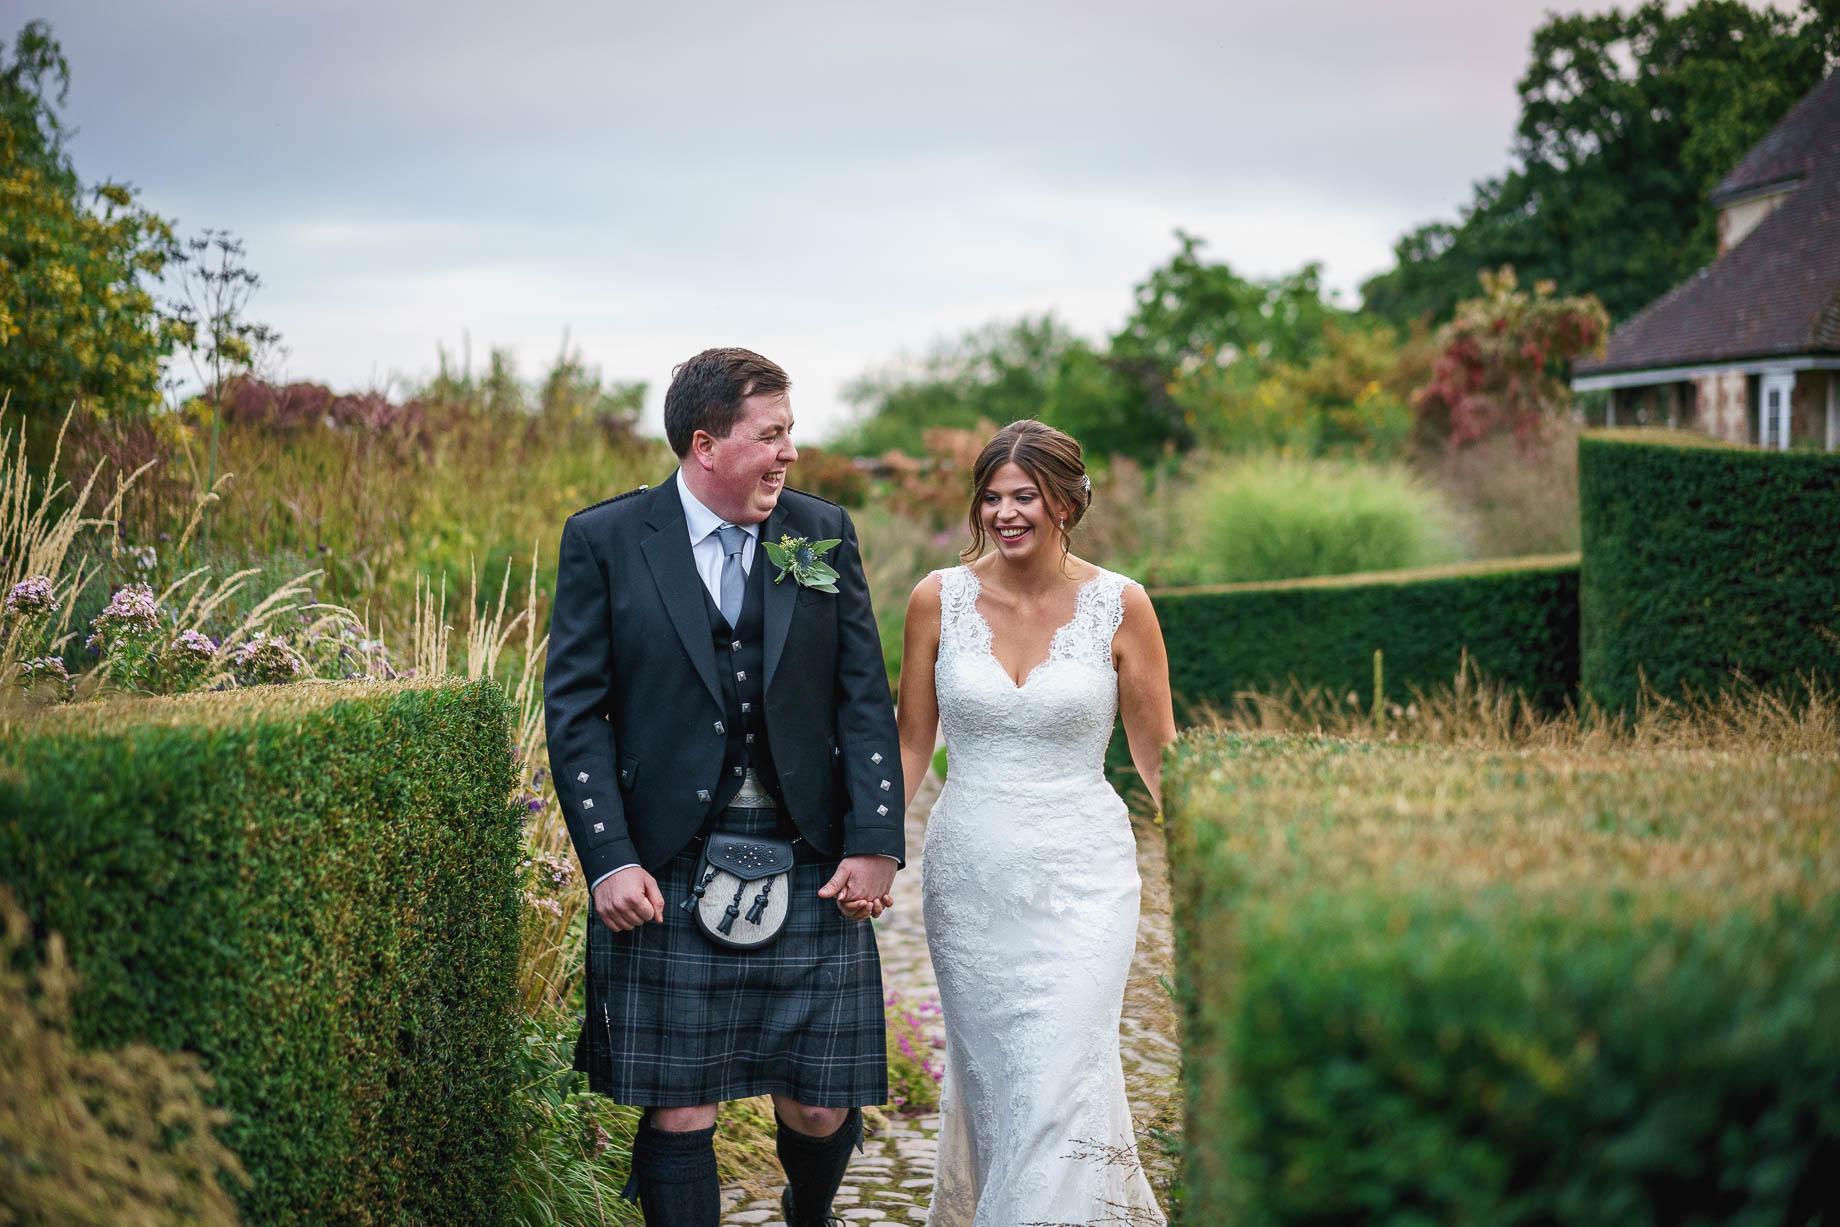 Bury Court Barn wedding photography - Esther + Gregor